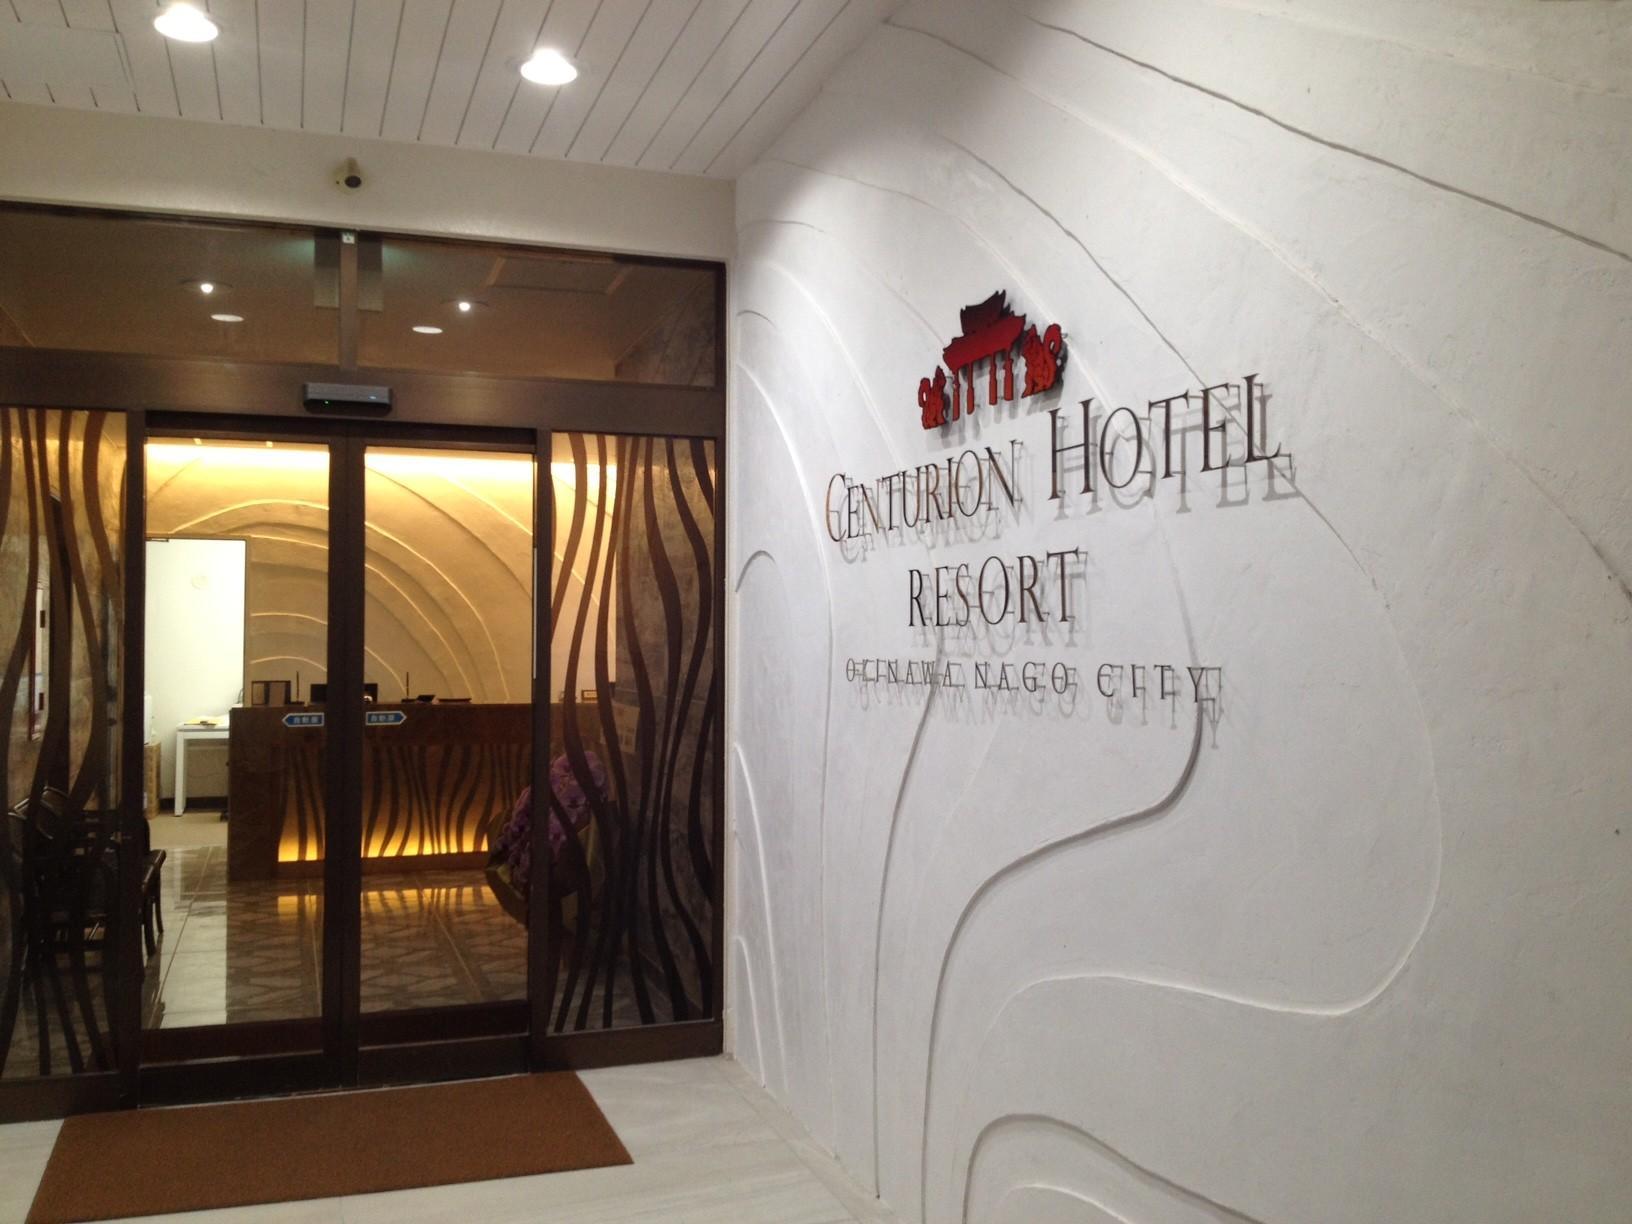 Centurion Hotel Resort Okinawa Nago City Details Explore